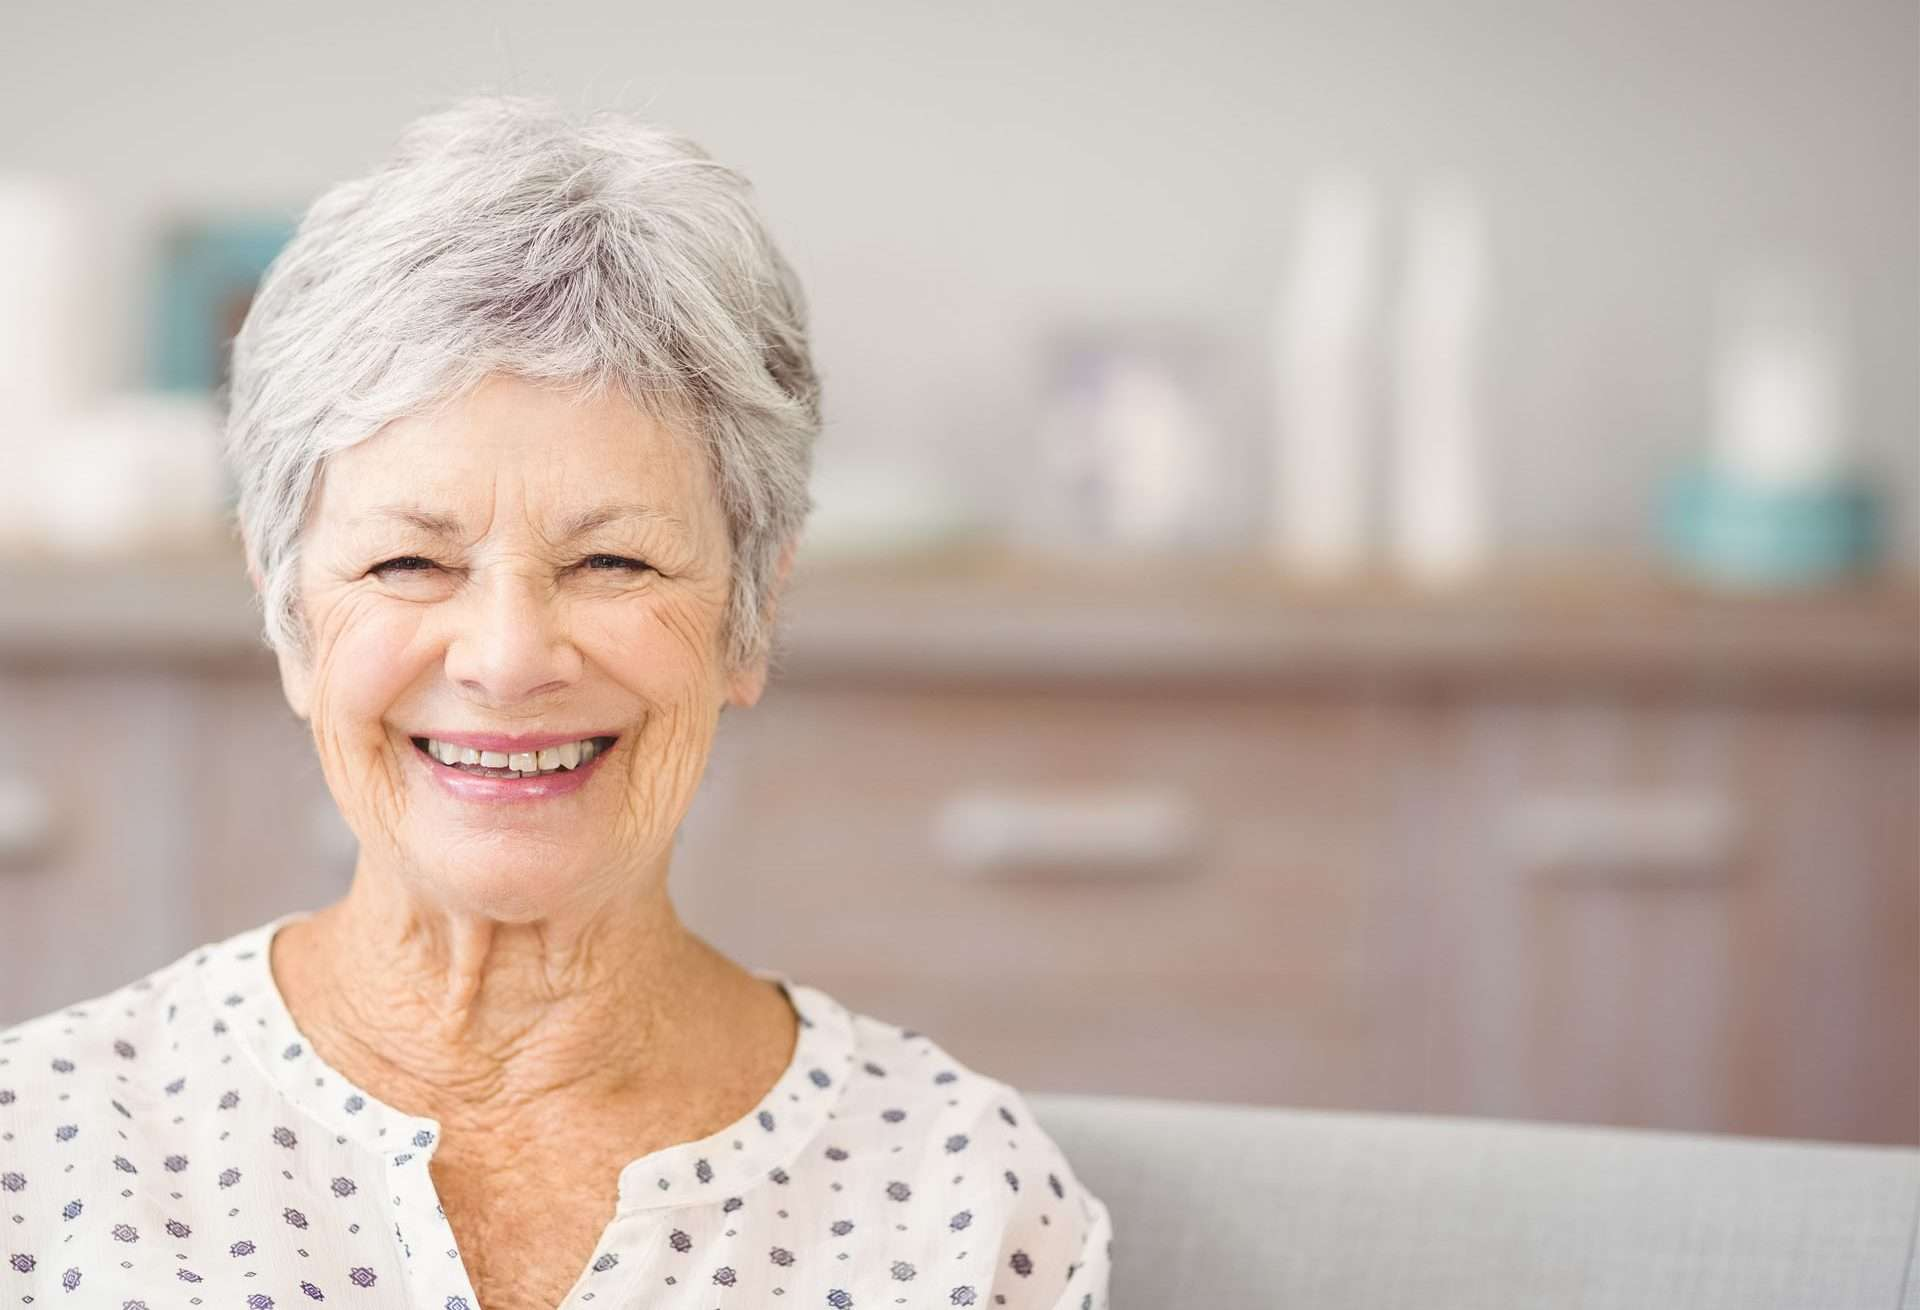 Client smiling